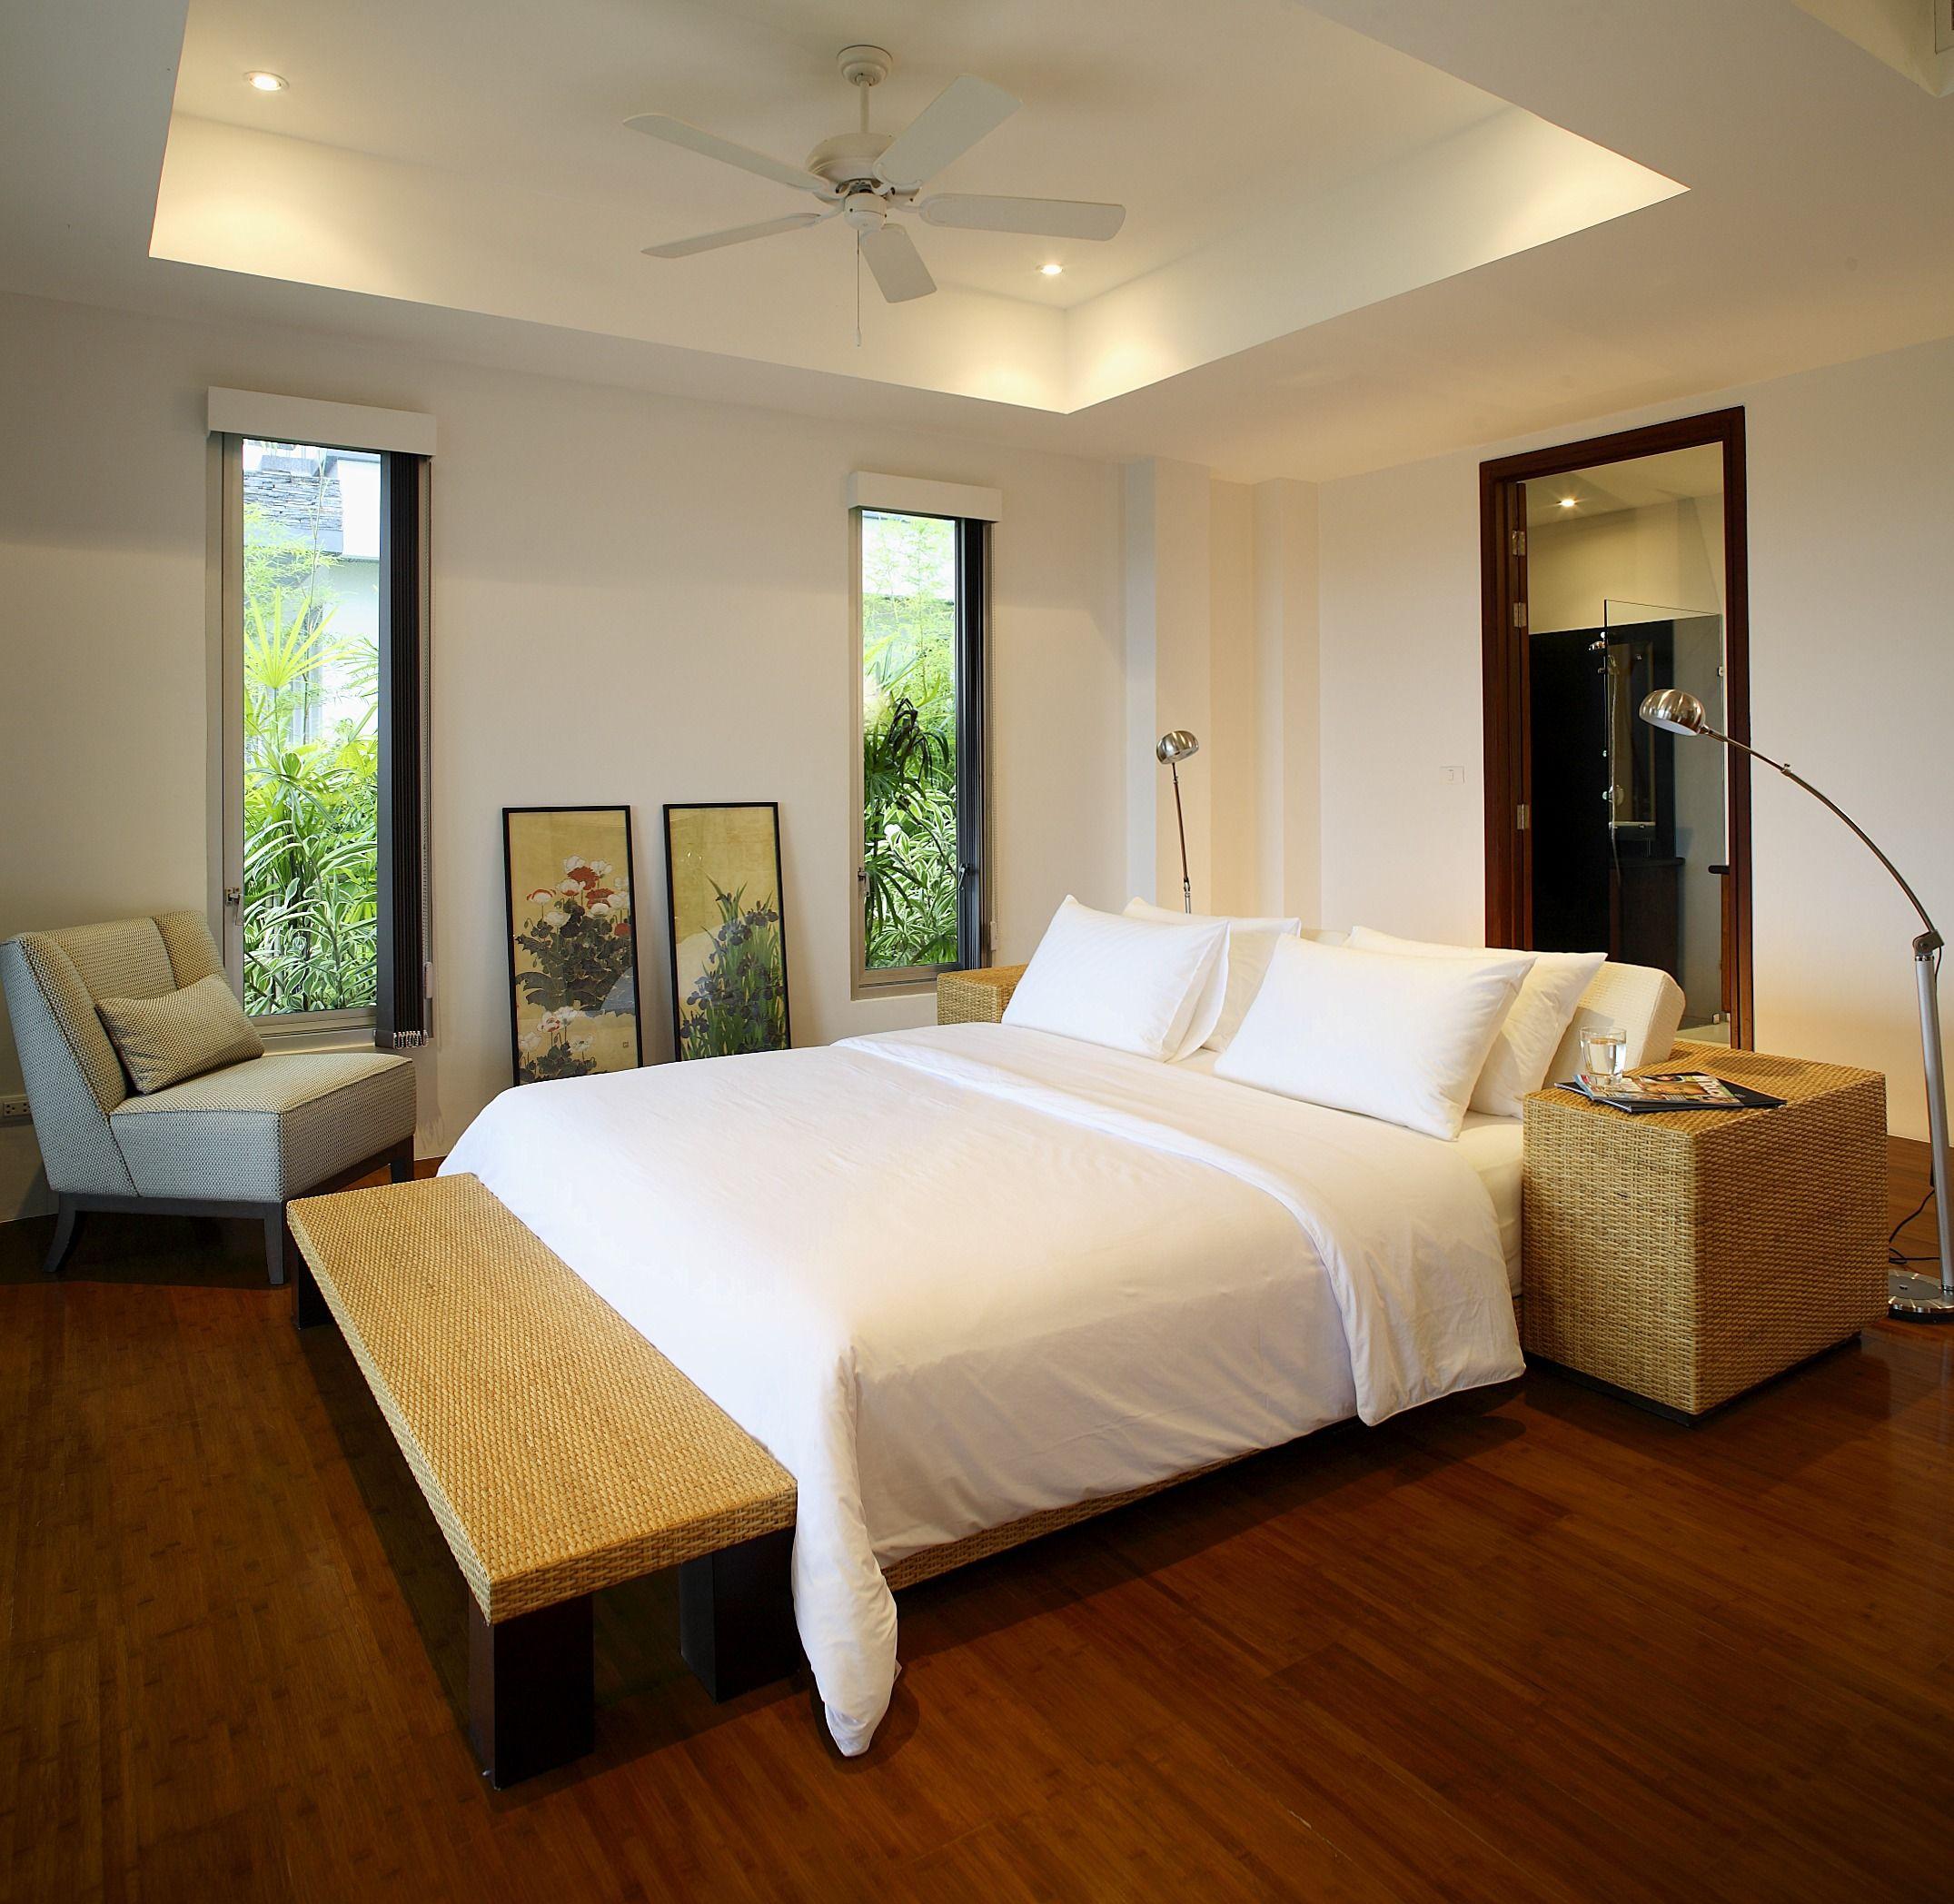 Master bedroom hardwood floors  Master Bedroom Makeover  Flooring installation Dark hardwood